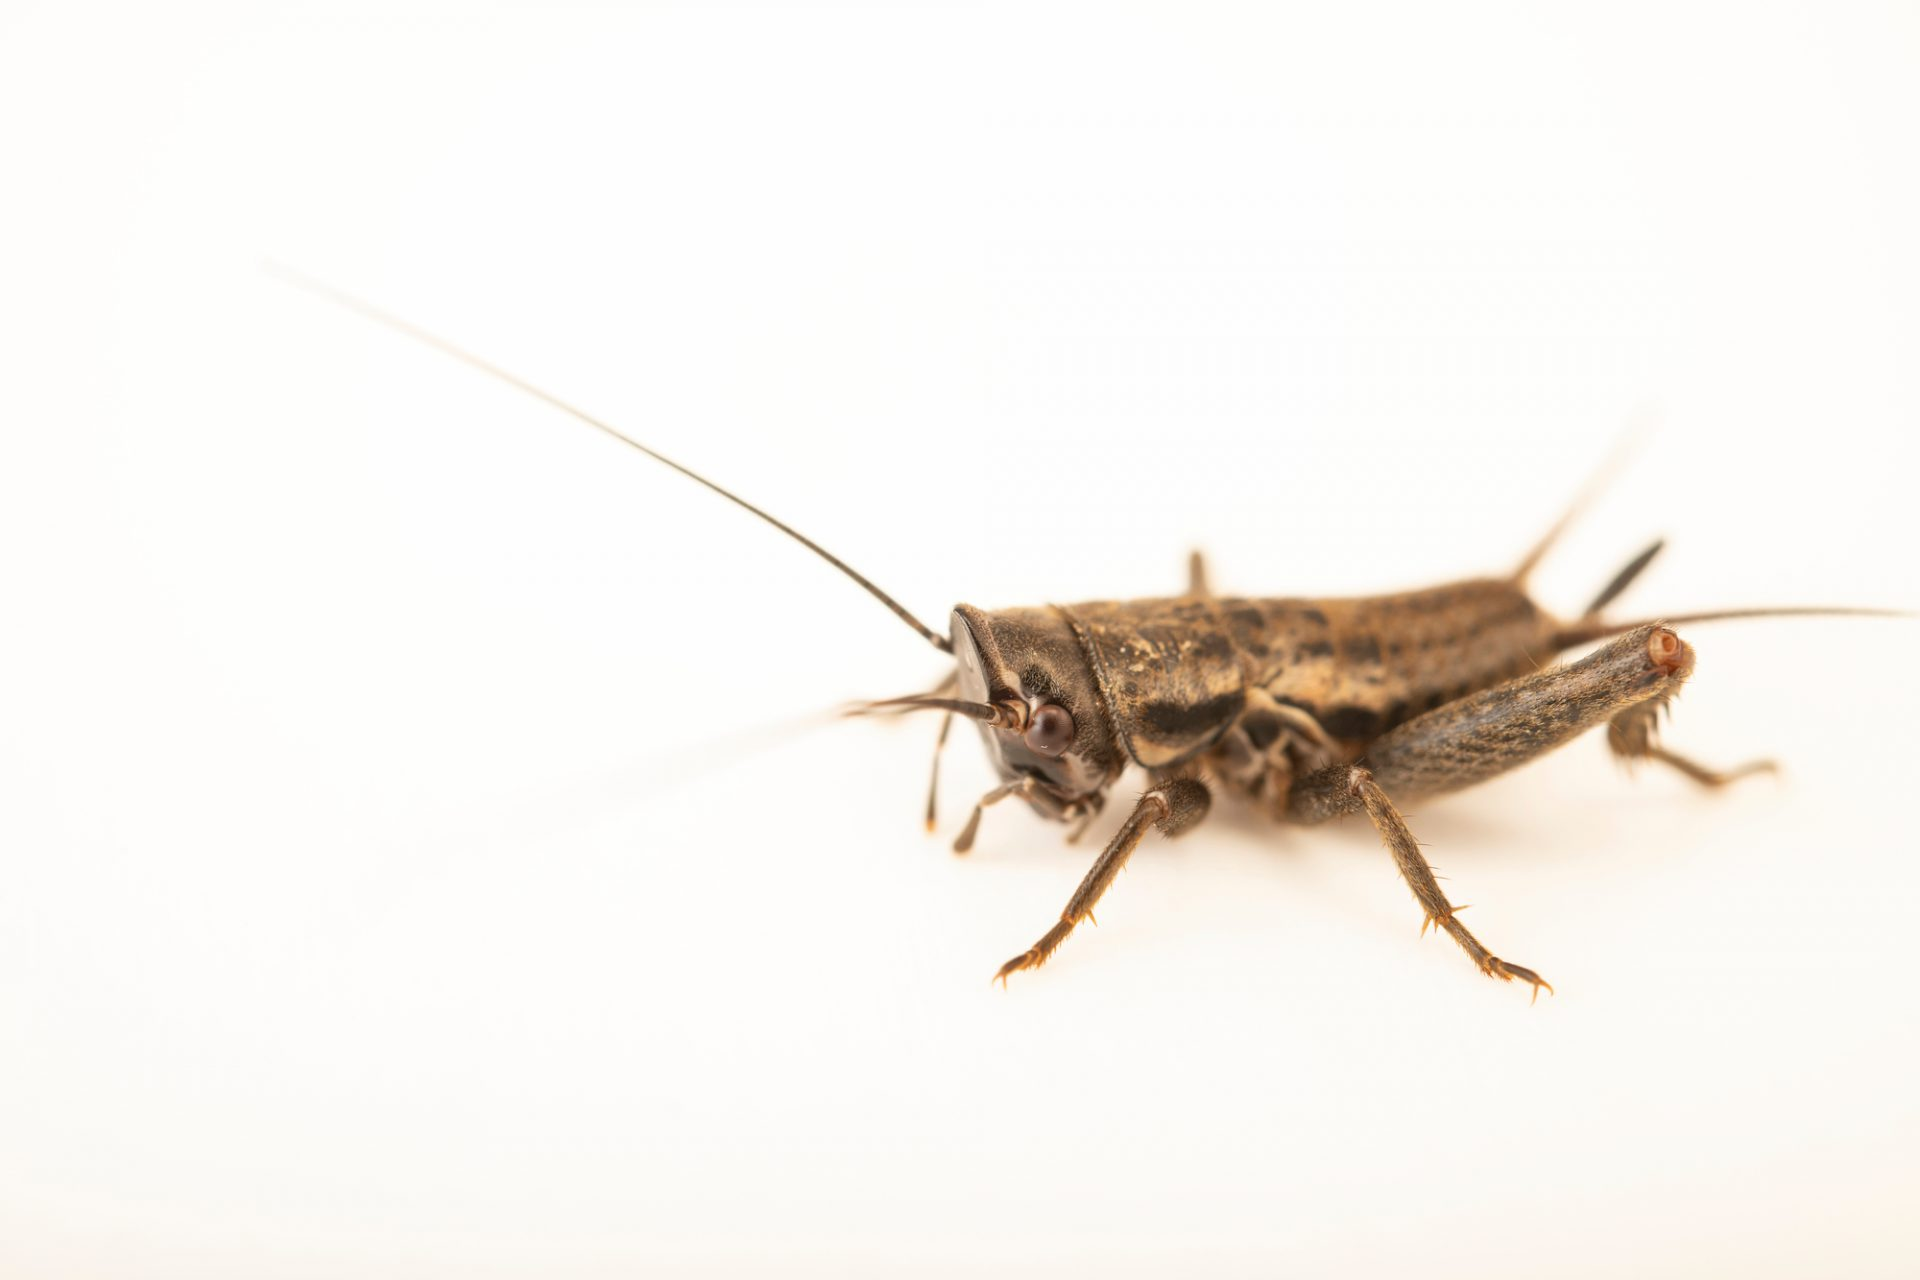 Female Lusitanian spade-cricket (Sciobia lusitanica) at Graham's Quinta dos Malvedos Vineyard.